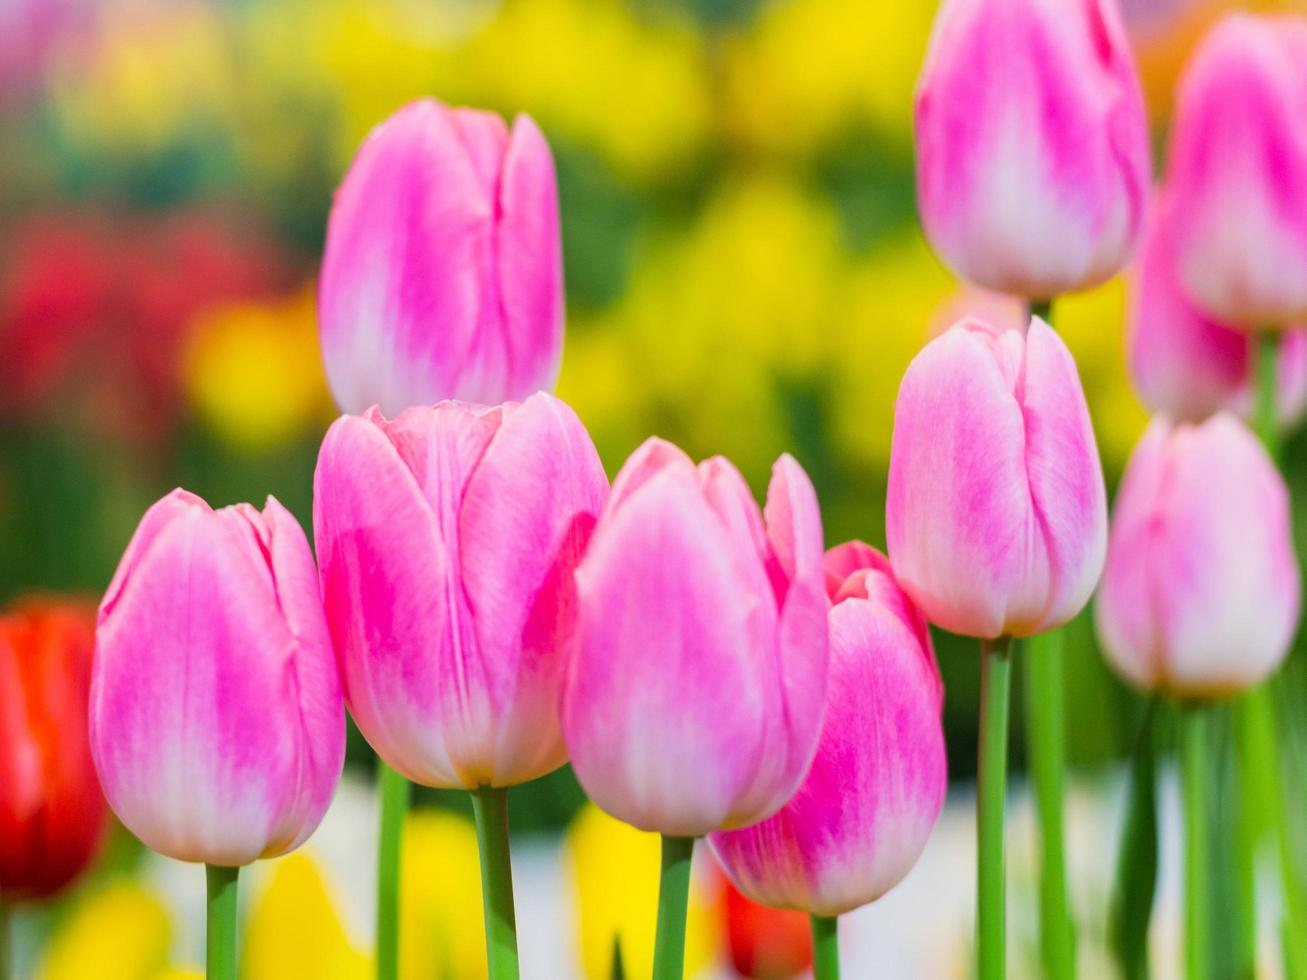 rosa Tulpen in voller Blüte foto